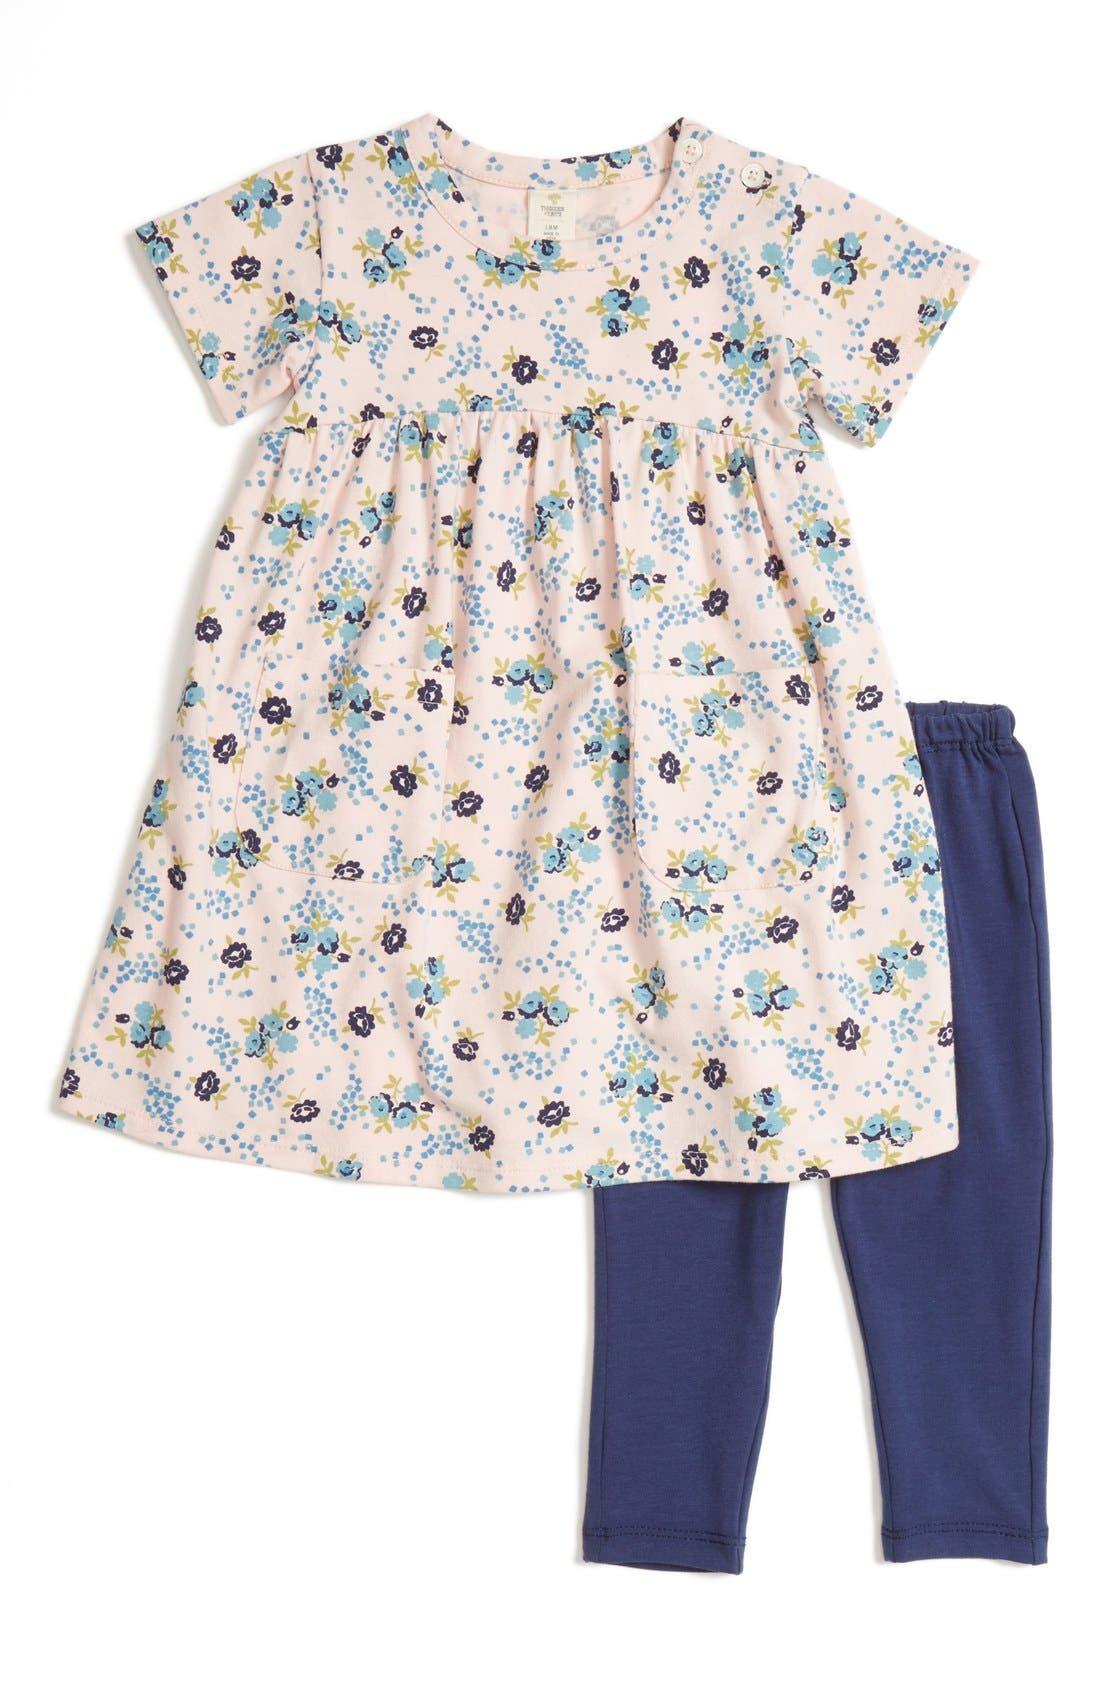 Alternate Image 1 Selected - Tucker + Tate Floral Print Dress & Leggings Set (Baby Girls)